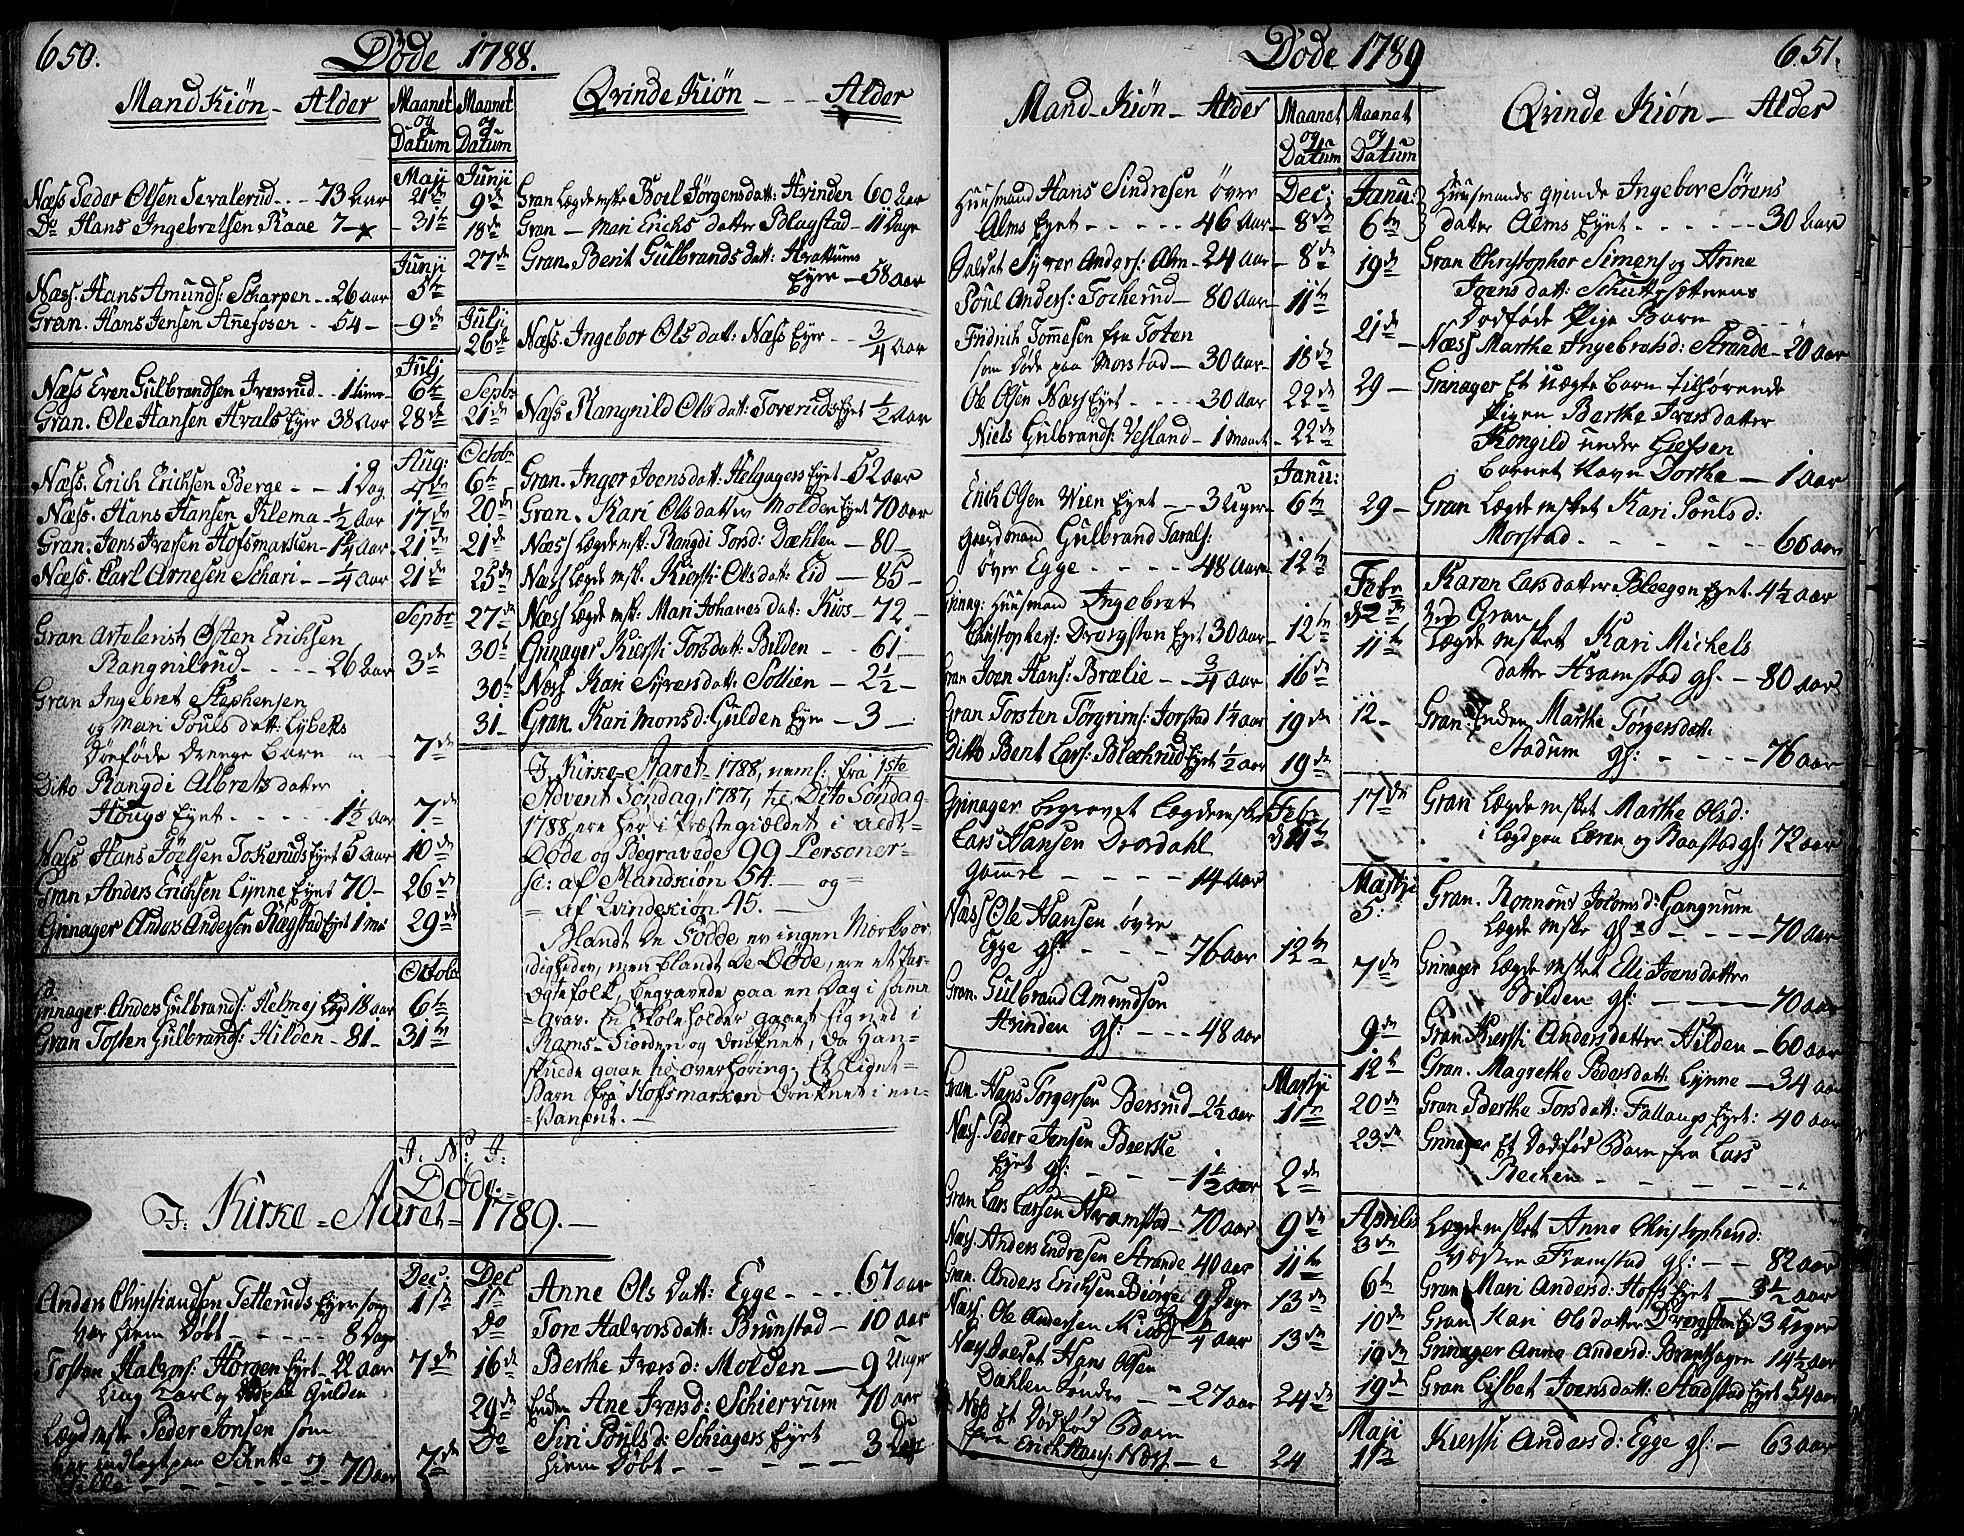 SAH, Gran prestekontor, Ministerialbok nr. 6, 1787-1824, s. 650-651